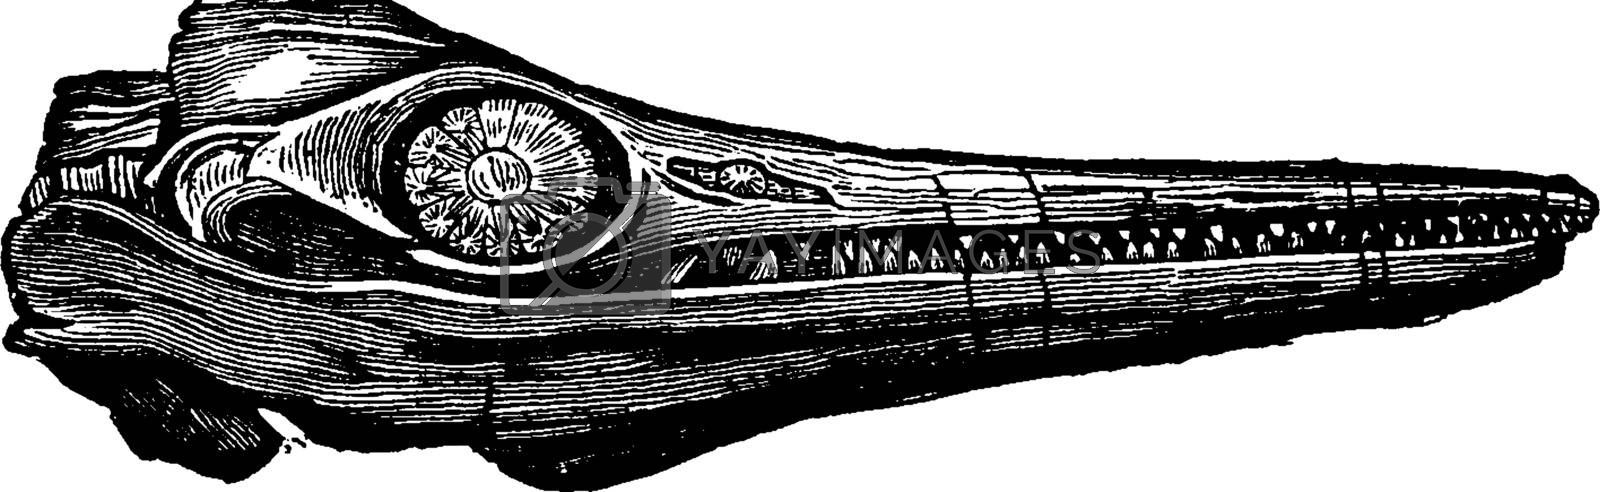 Ichthyosaur fossil head, vintage engraving. by Morphart